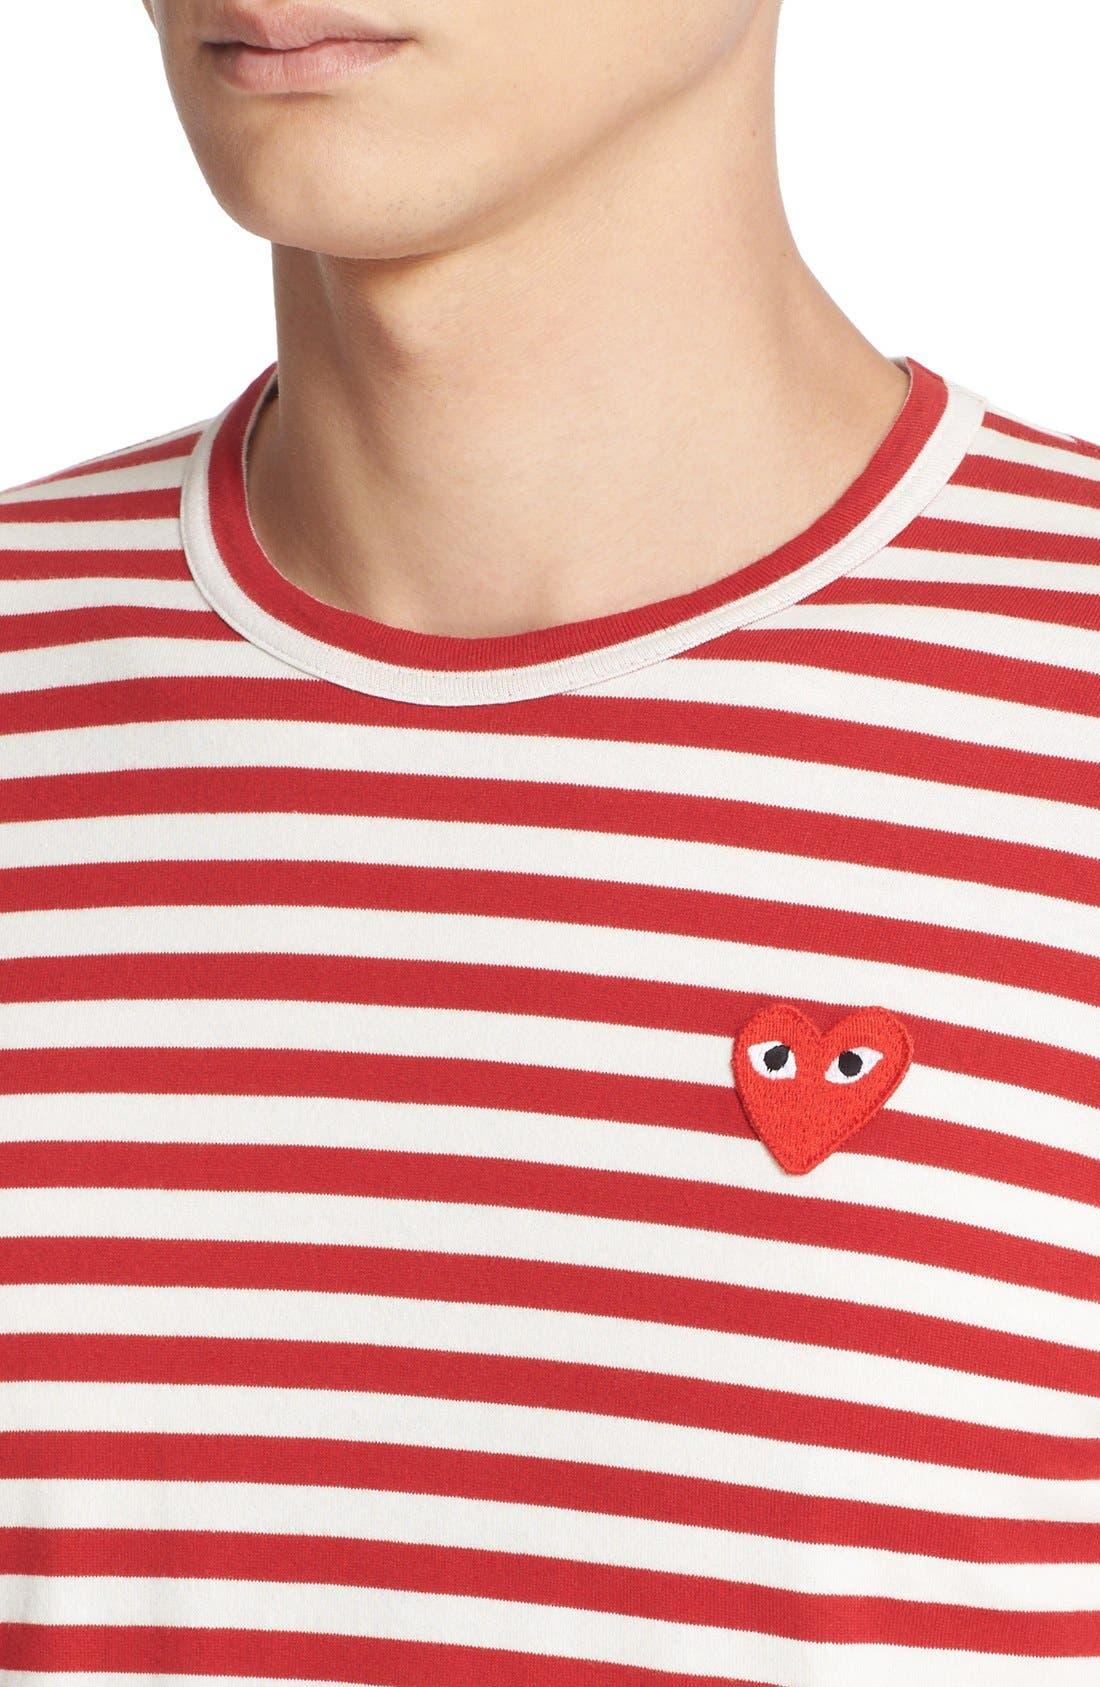 Comme des Garçons PLAY Stripe Long Sleeve T-Shirt,                             Alternate thumbnail 4, color,                             Red/ White